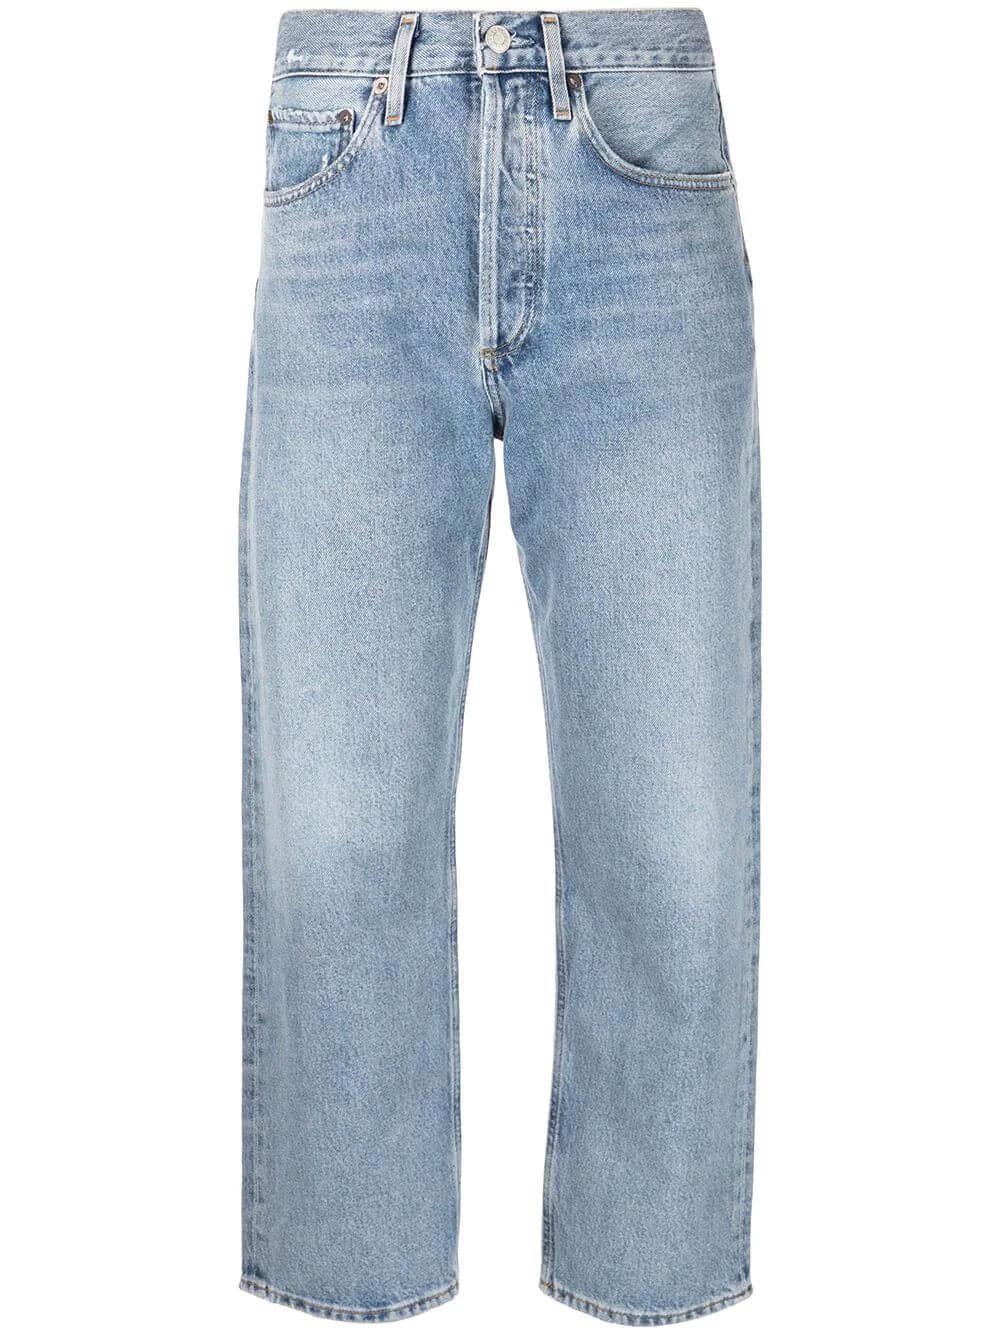 90's Crop Straight Leg Jean Item # A173-1141